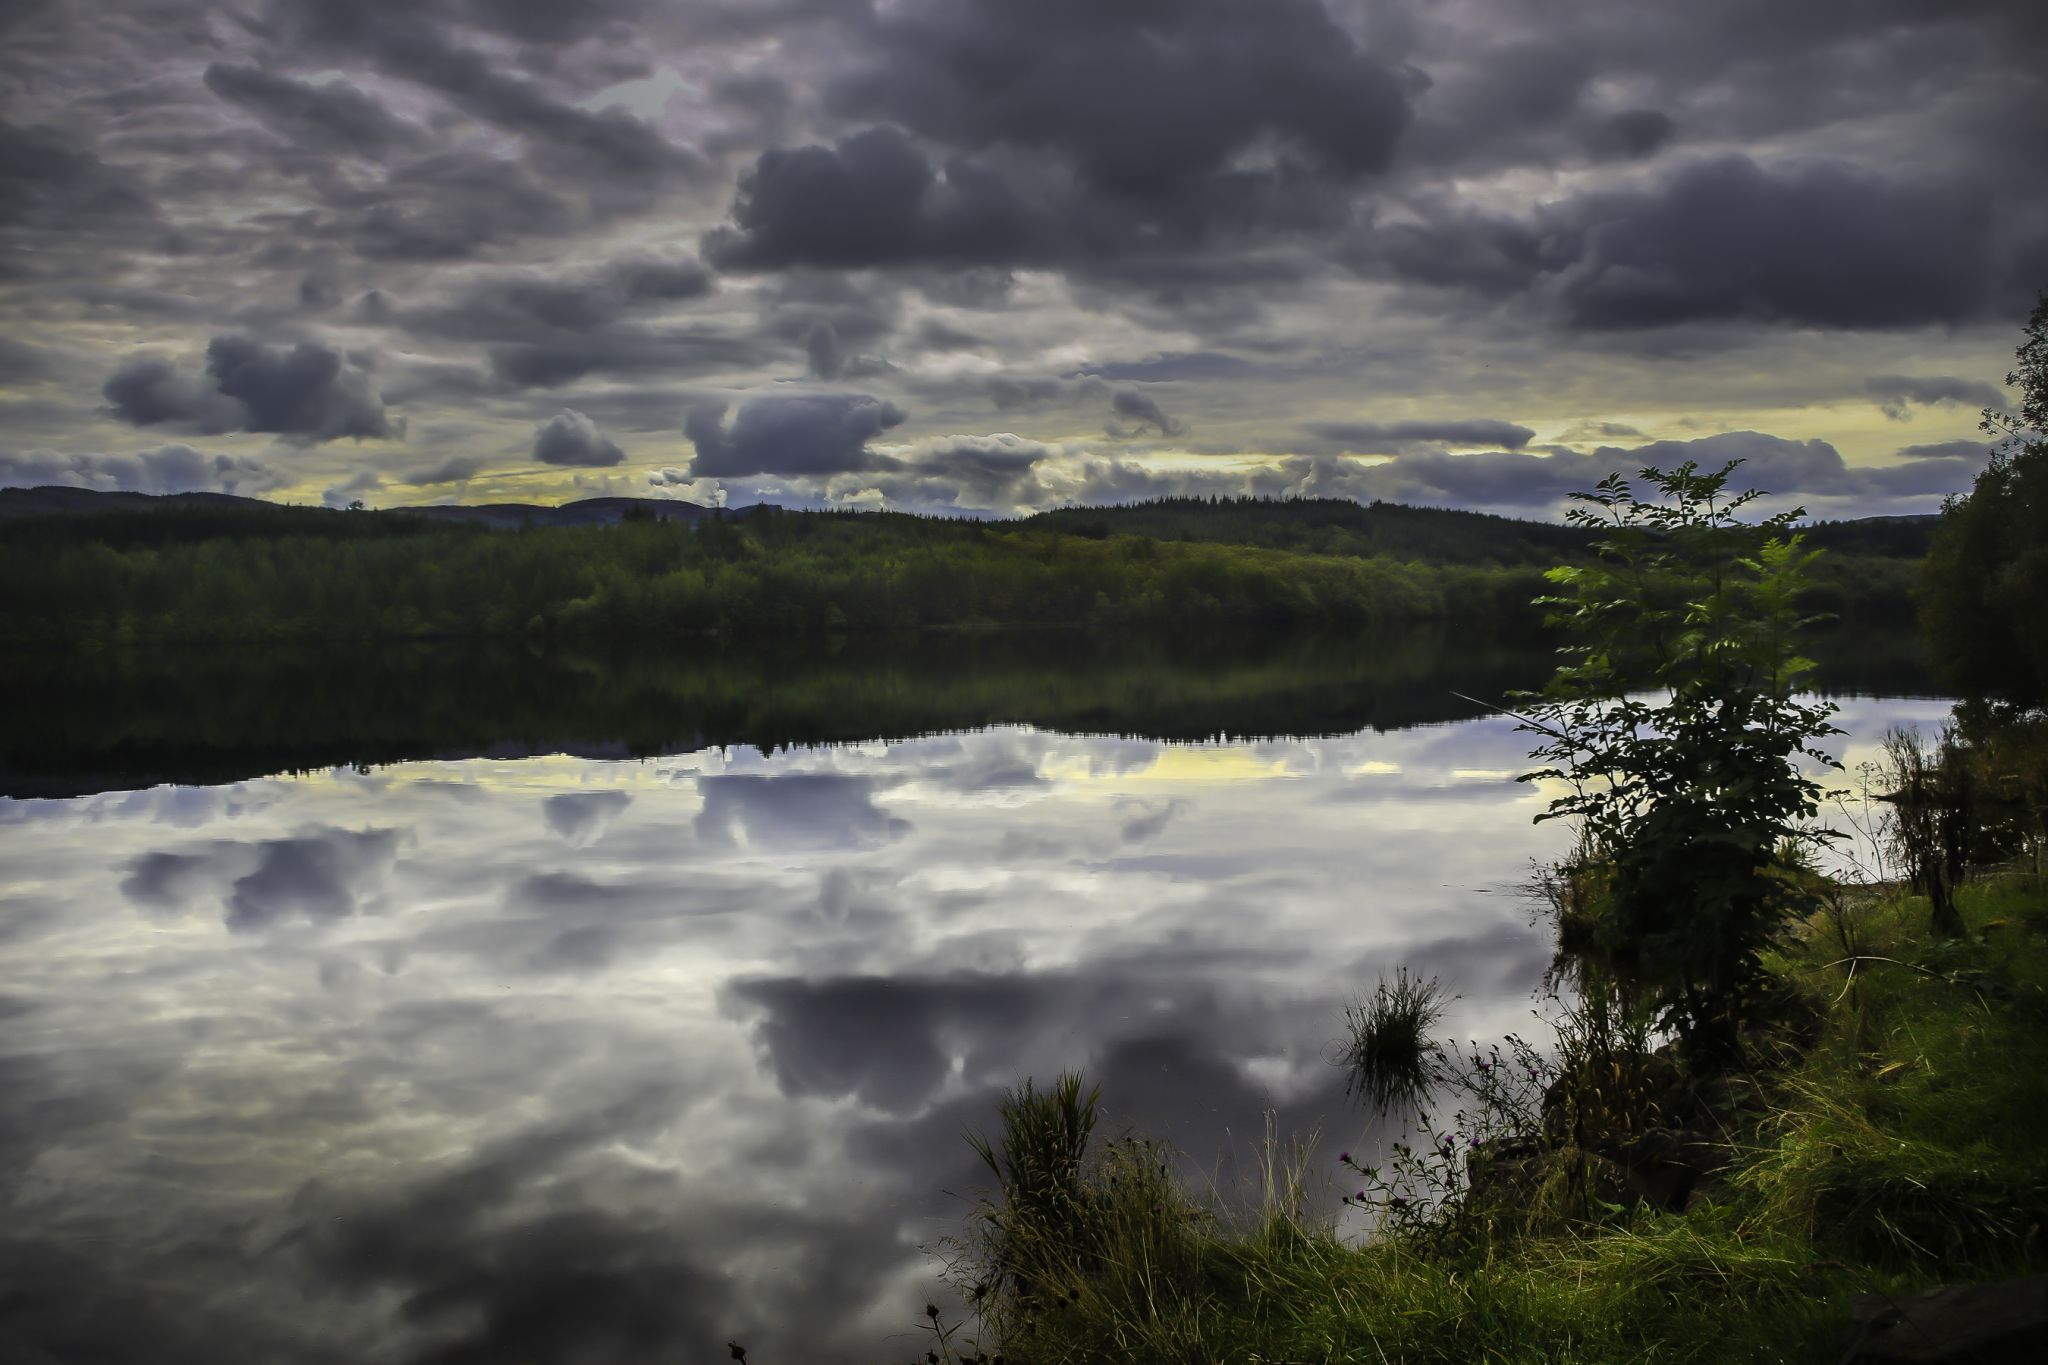 Loch Venachar, Scotland, United Kingdom